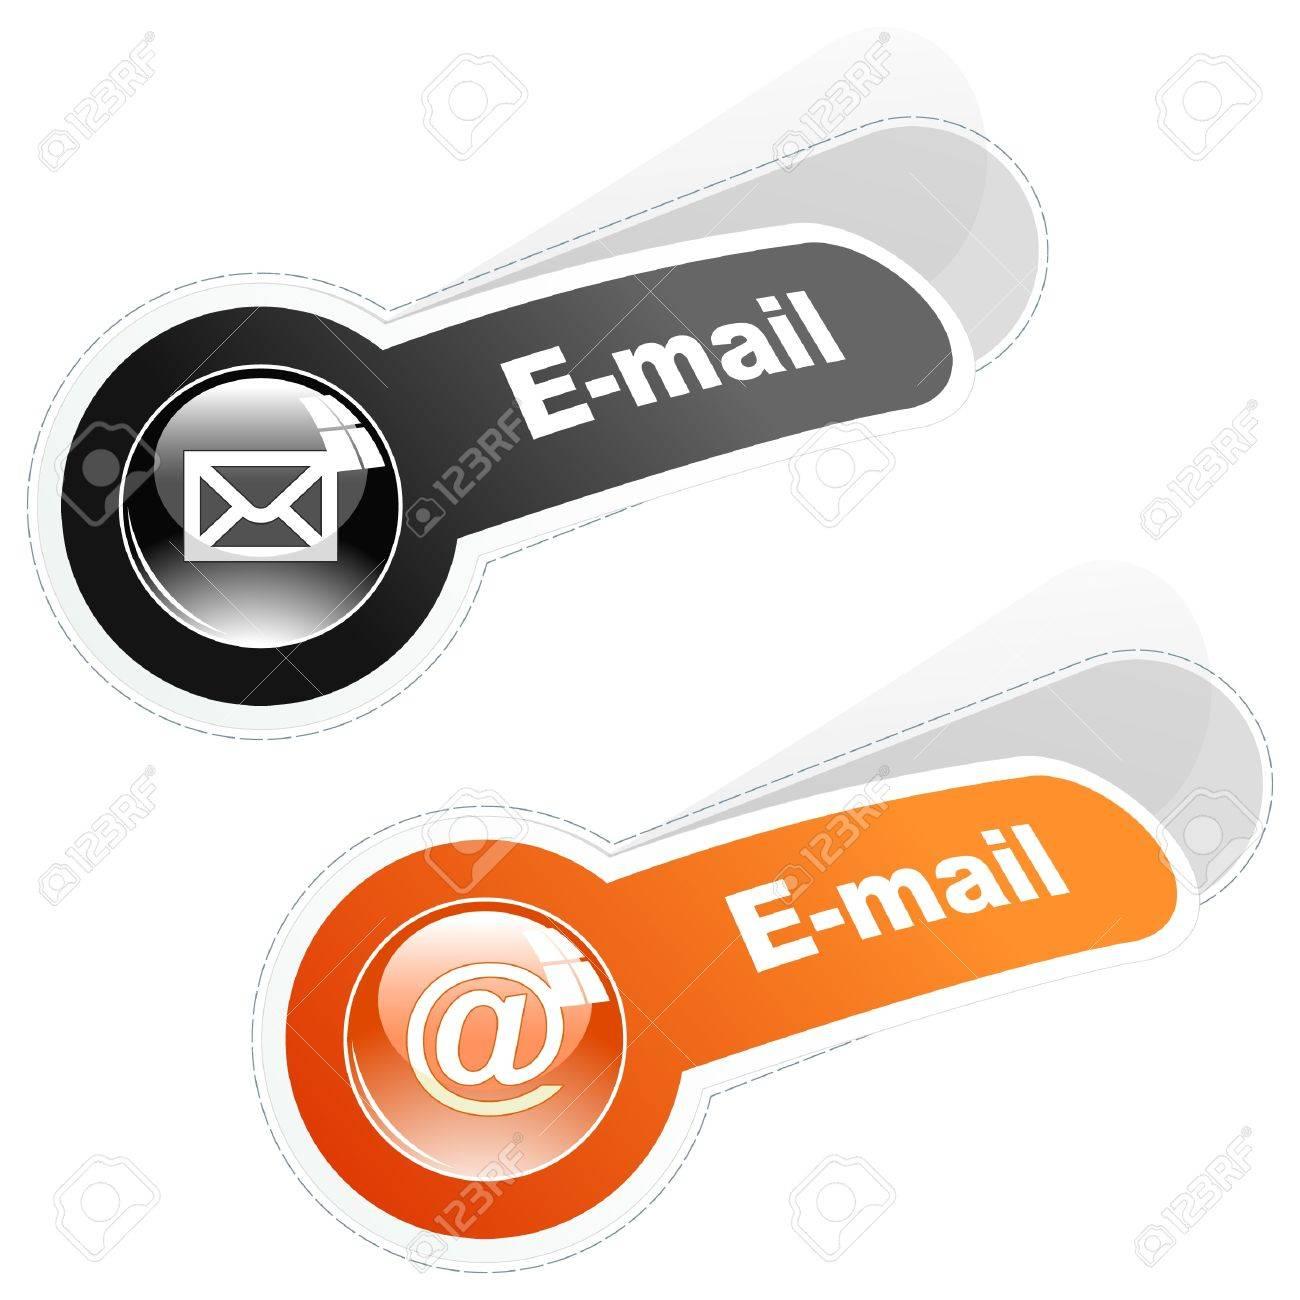 E-mail. Sticker set for web. Stock Vector - 9901768